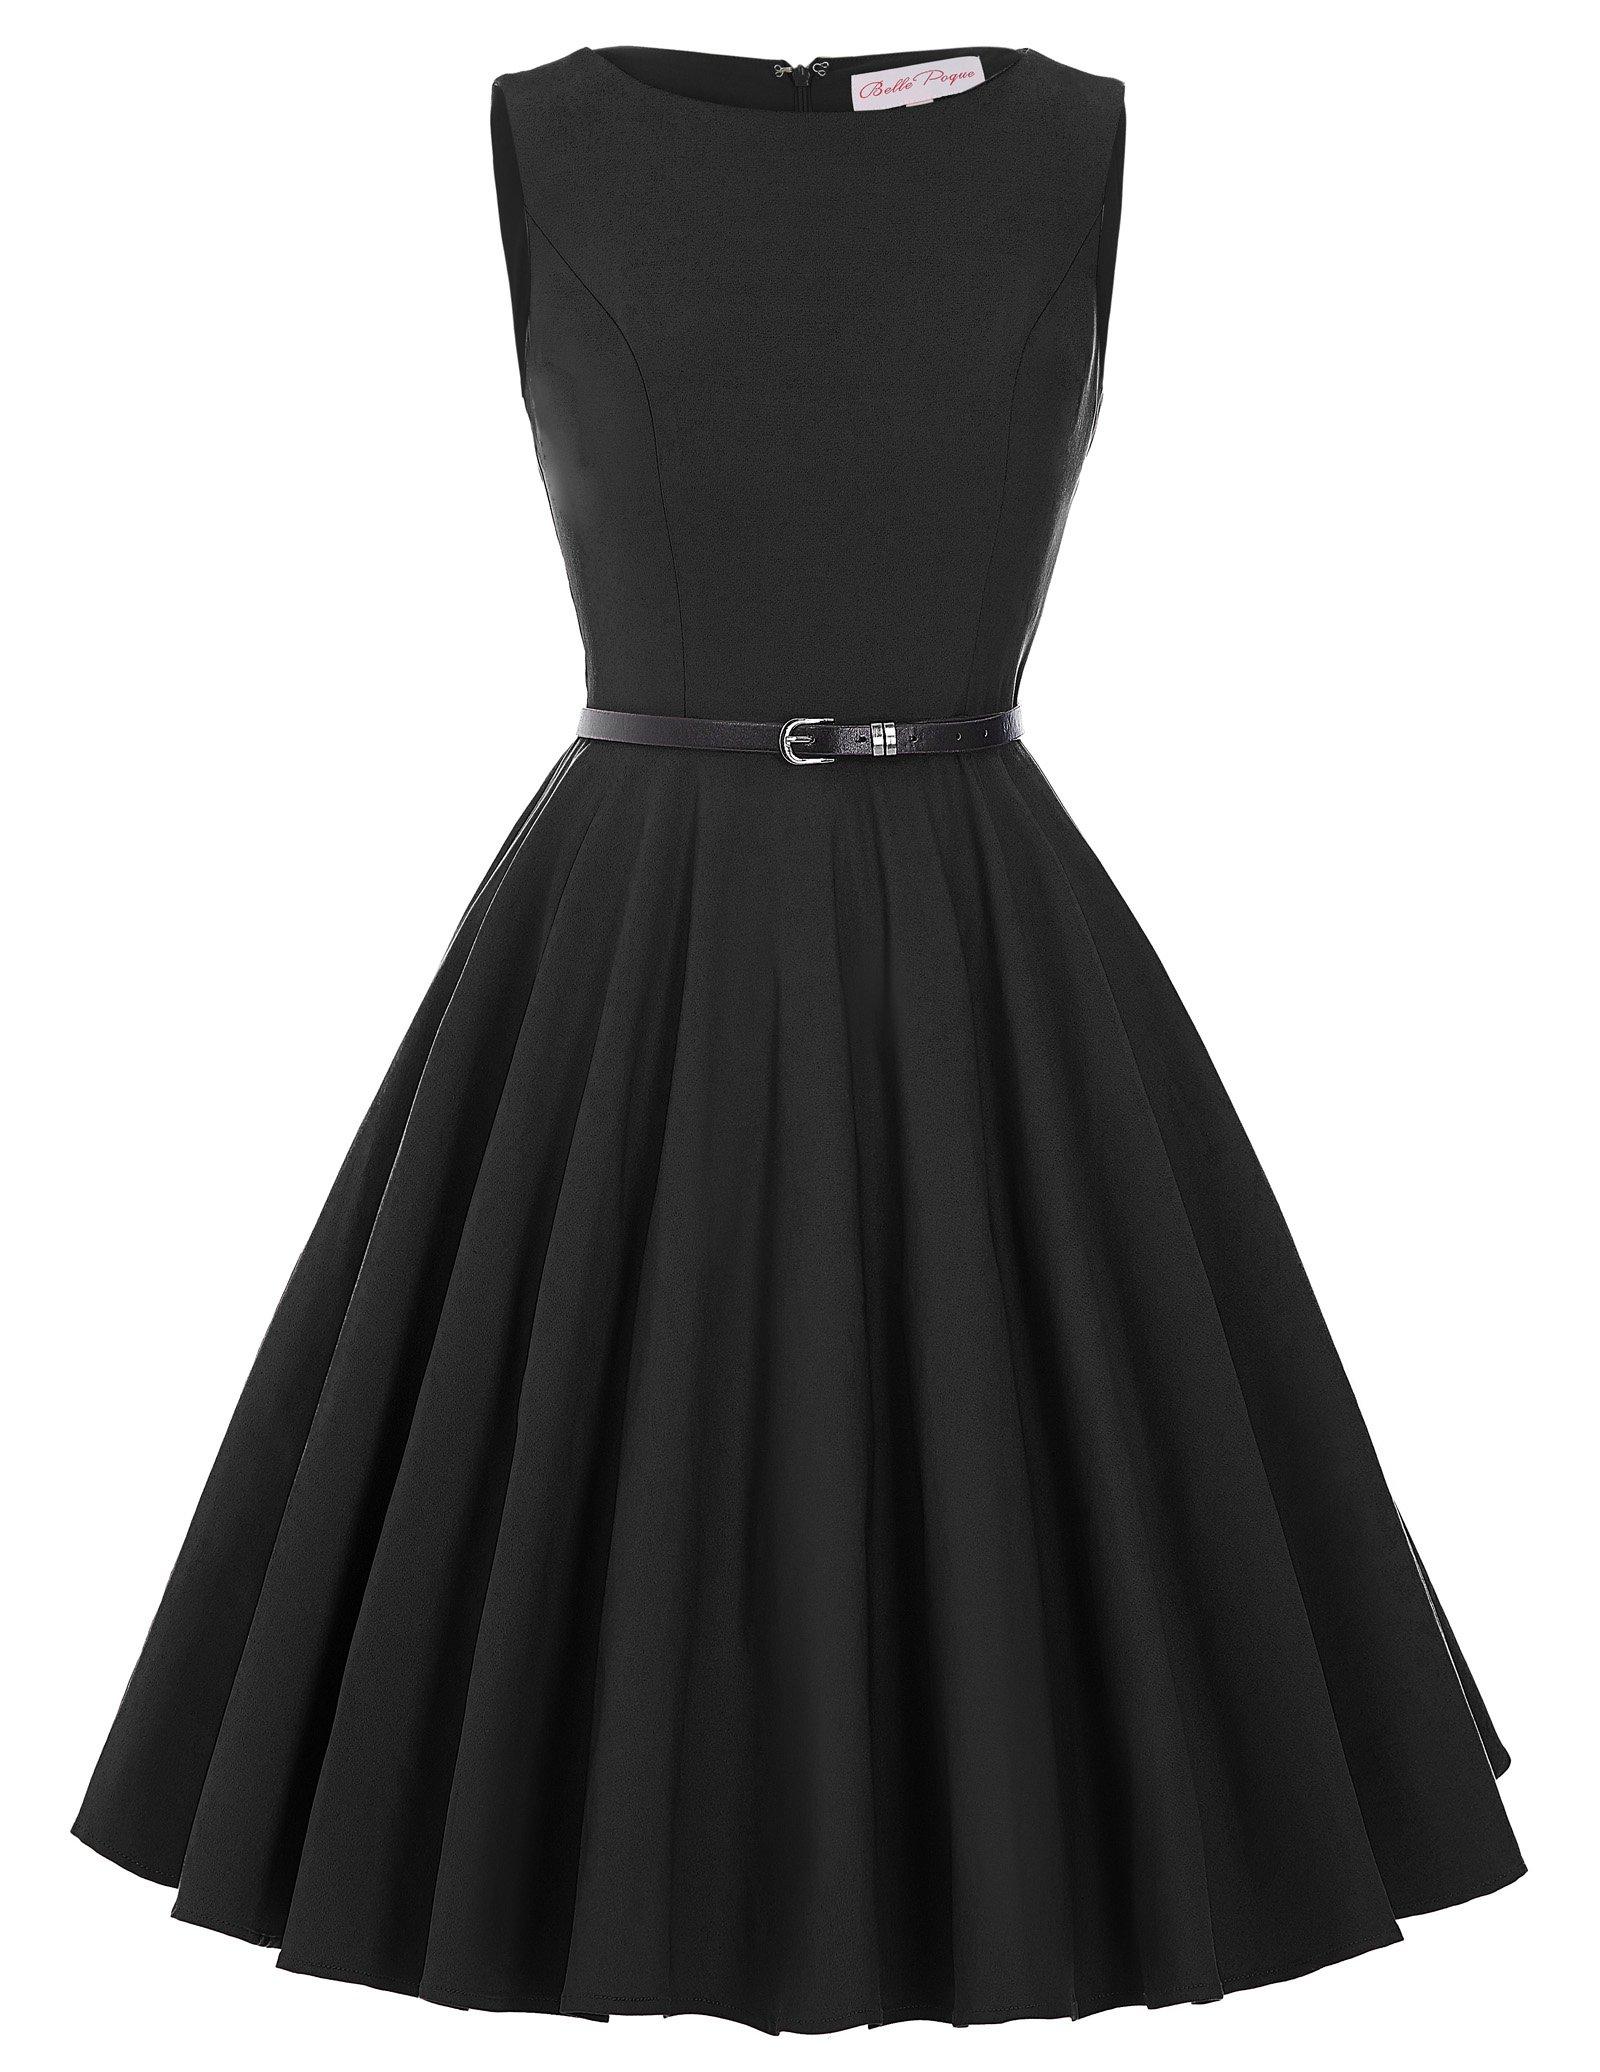 Sleeveless Cocktail Swing Dress Vintage Style BP157-1,,Black,X-Large